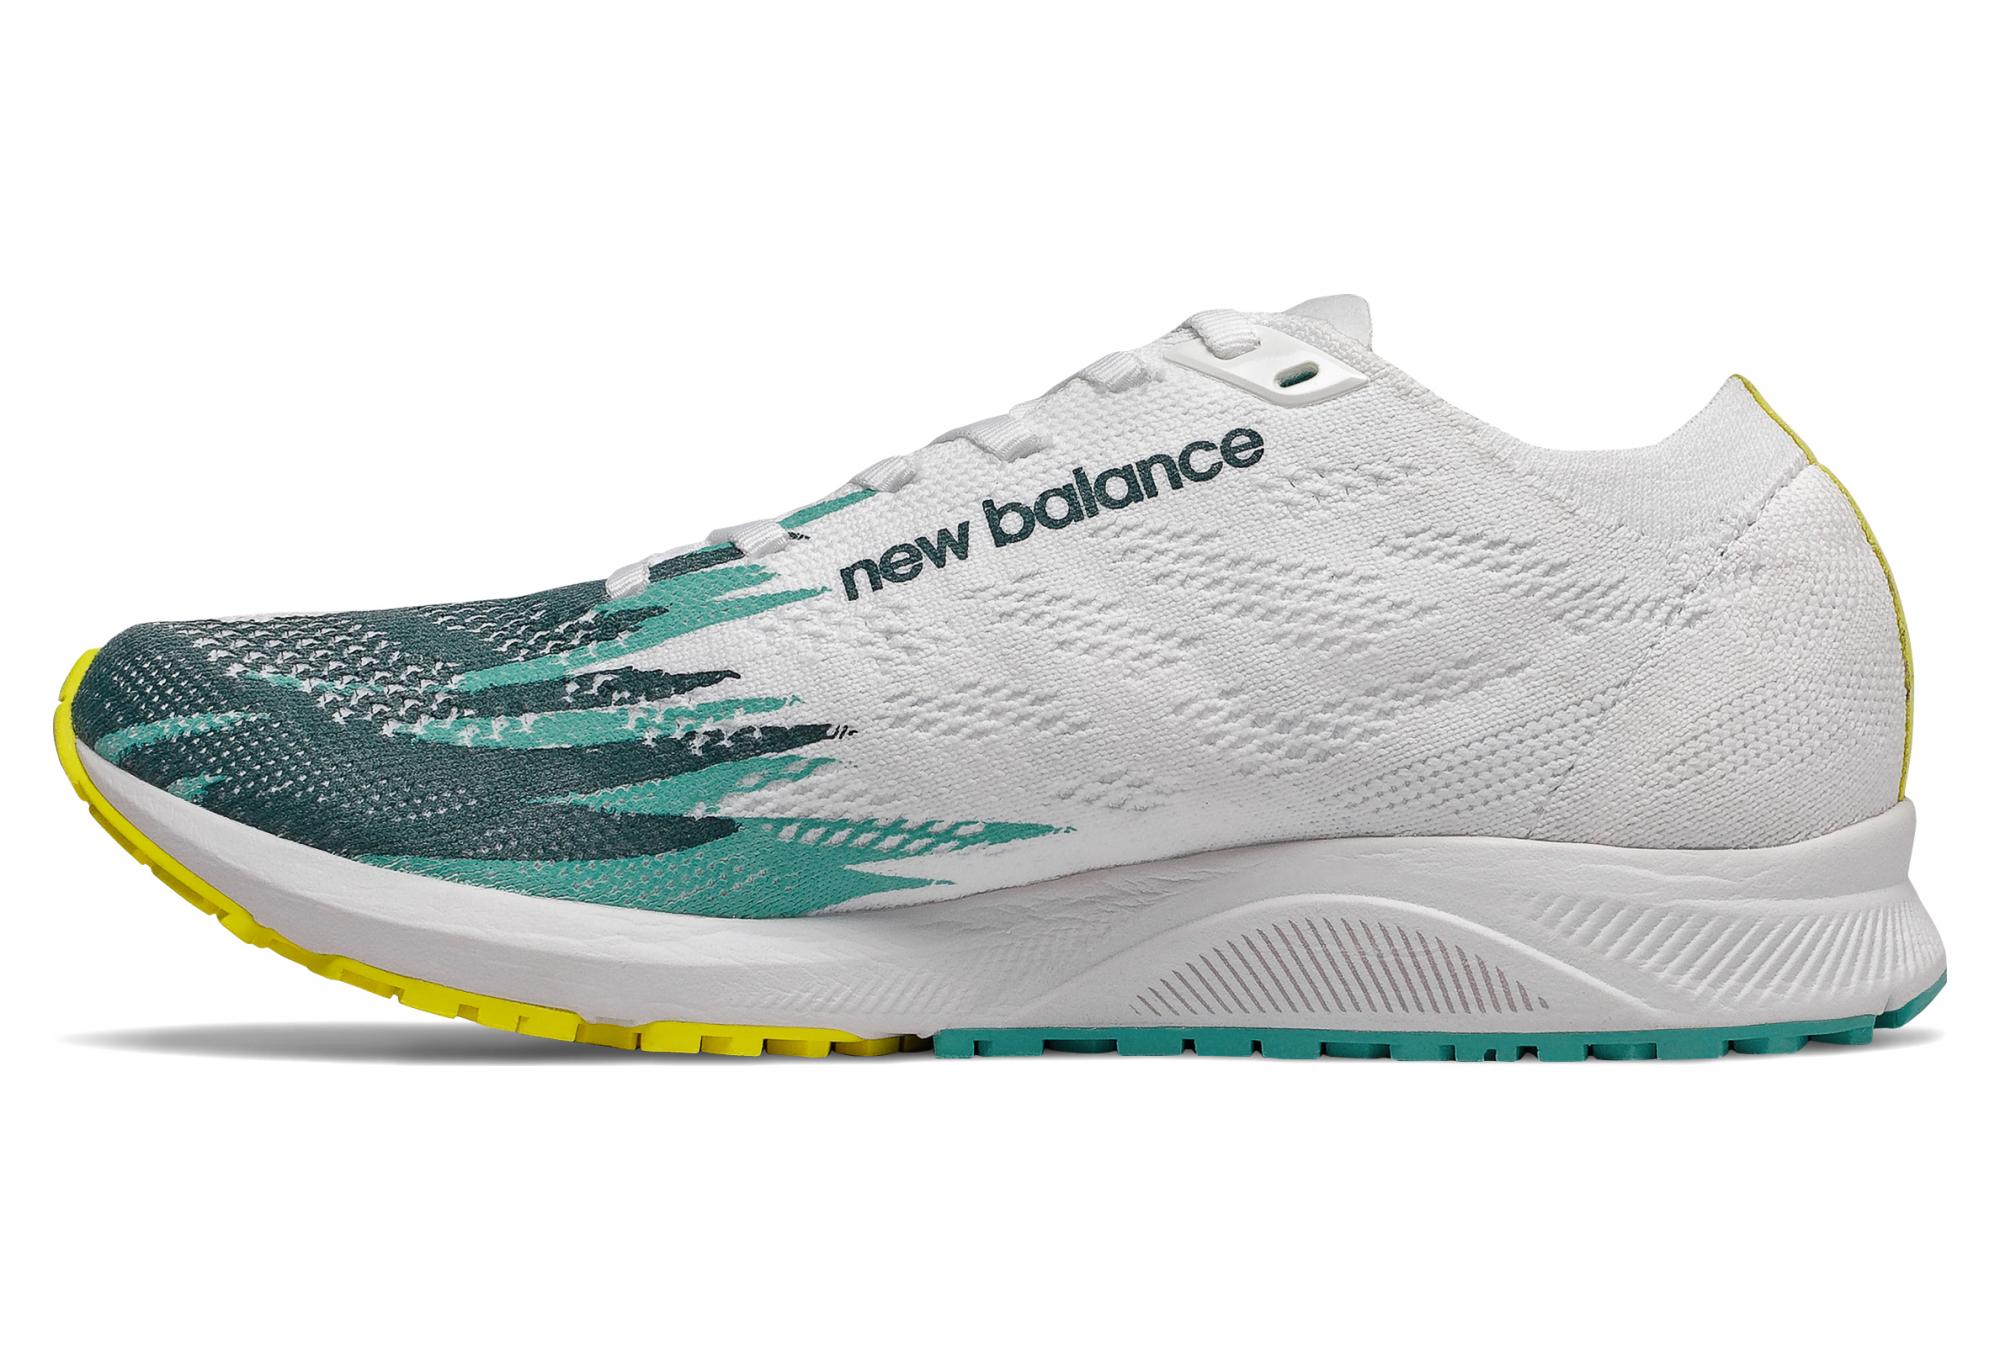 new balance 1500 v6